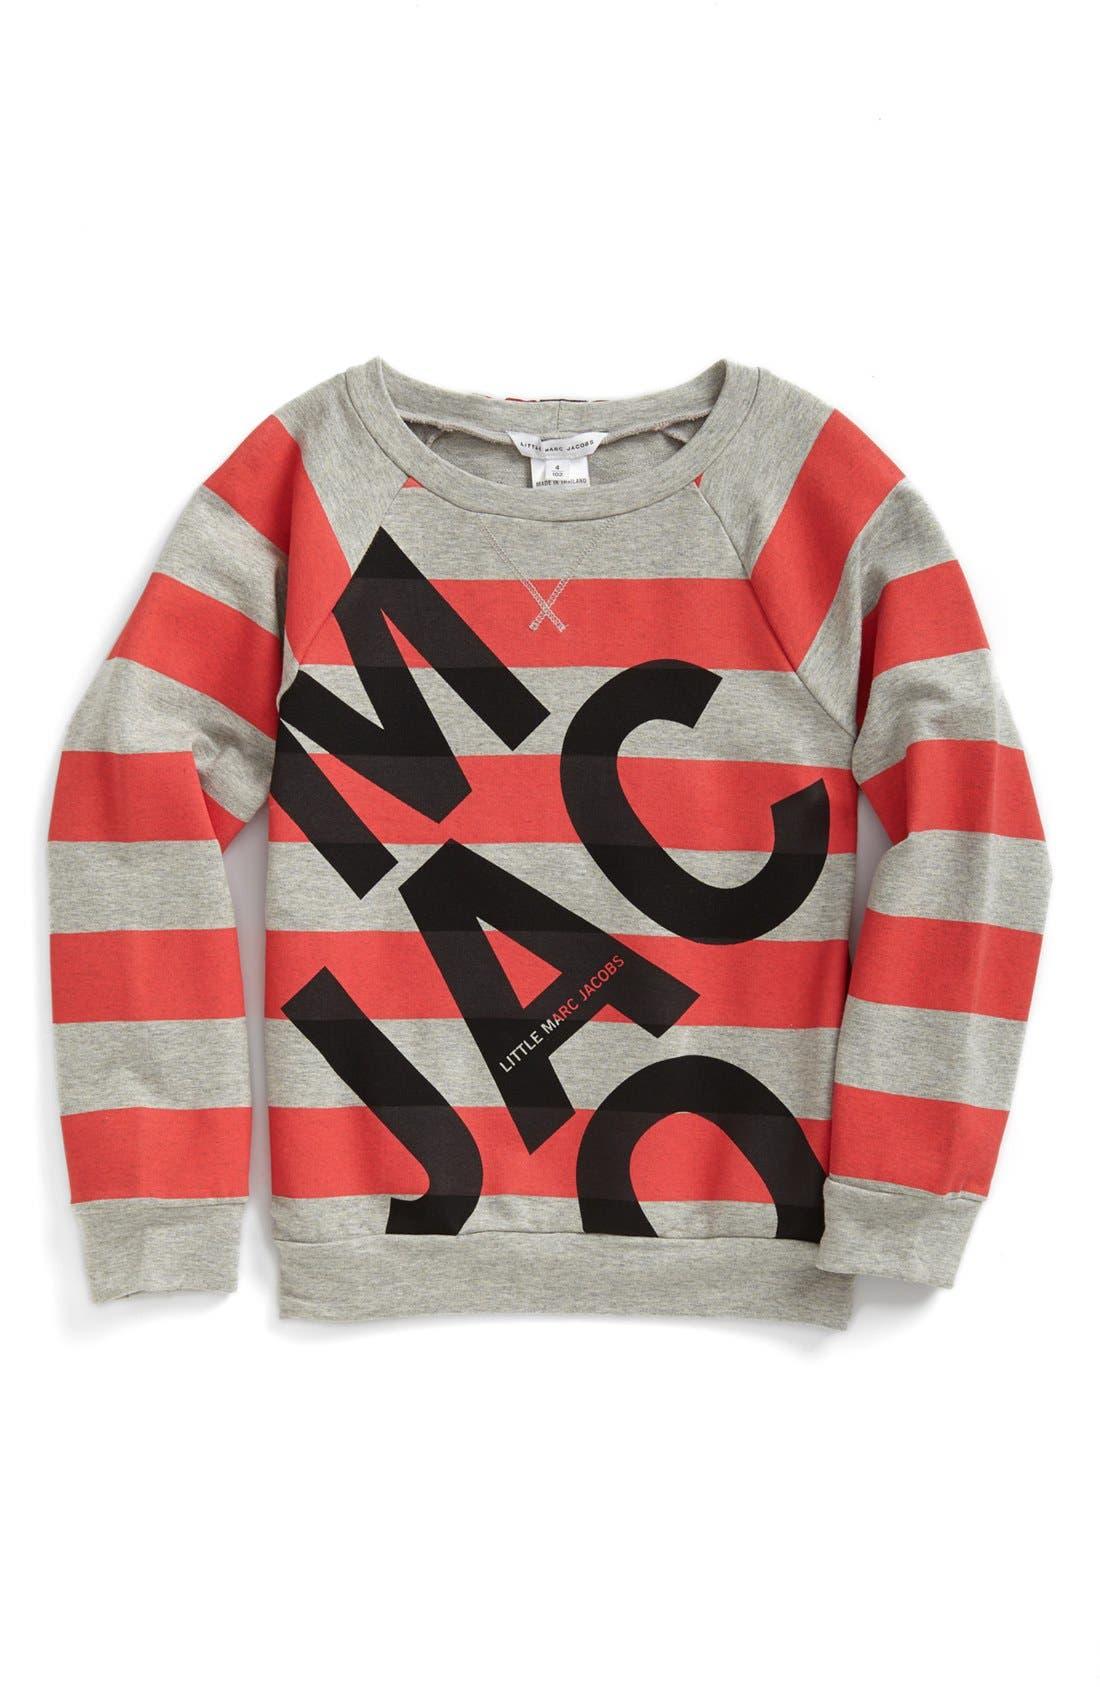 Alternate Image 1 Selected - LITTLE MARC JACOBS 'Block Letter' Sweatshirt (Toddler Girls)